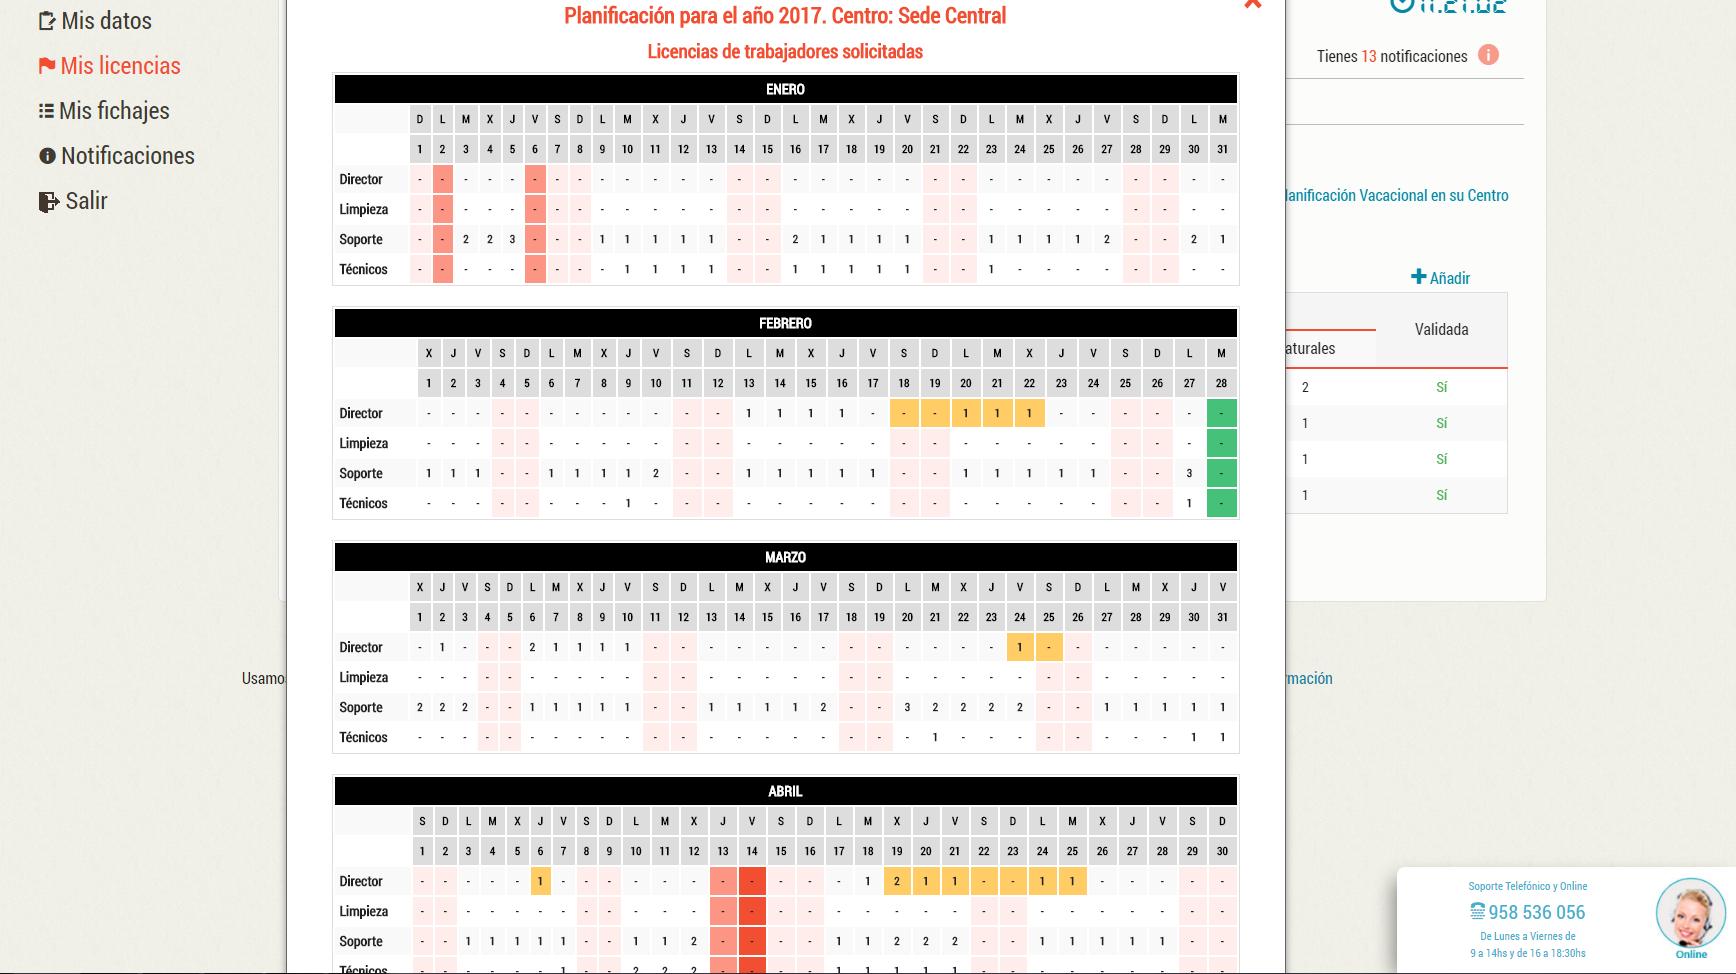 Calendario de licencias solicitadas